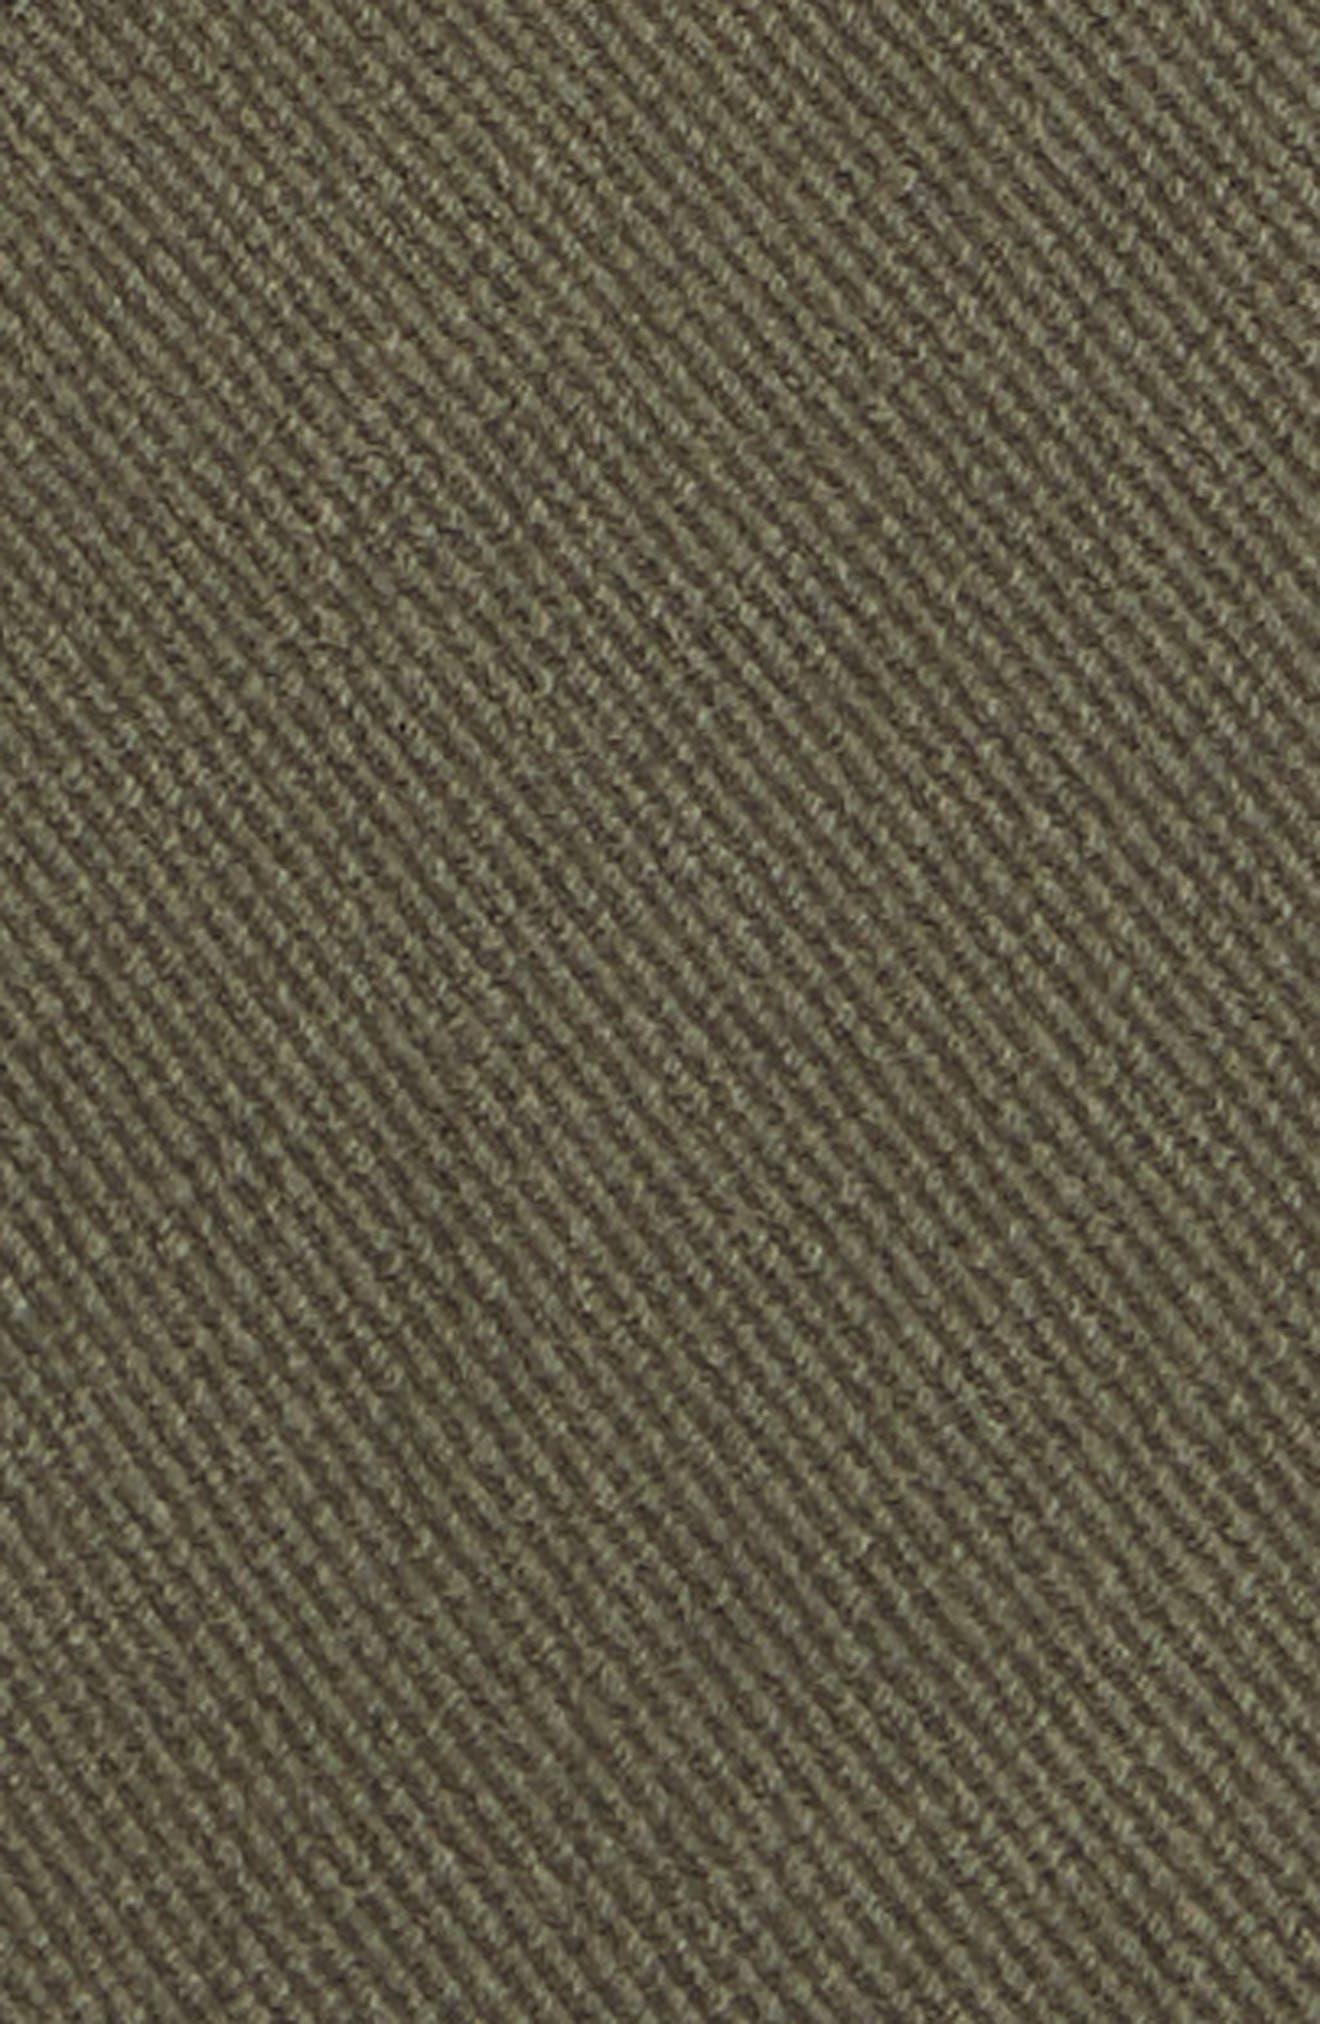 Utility Skinny Jeans,                             Alternate thumbnail 5, color,                             Moss